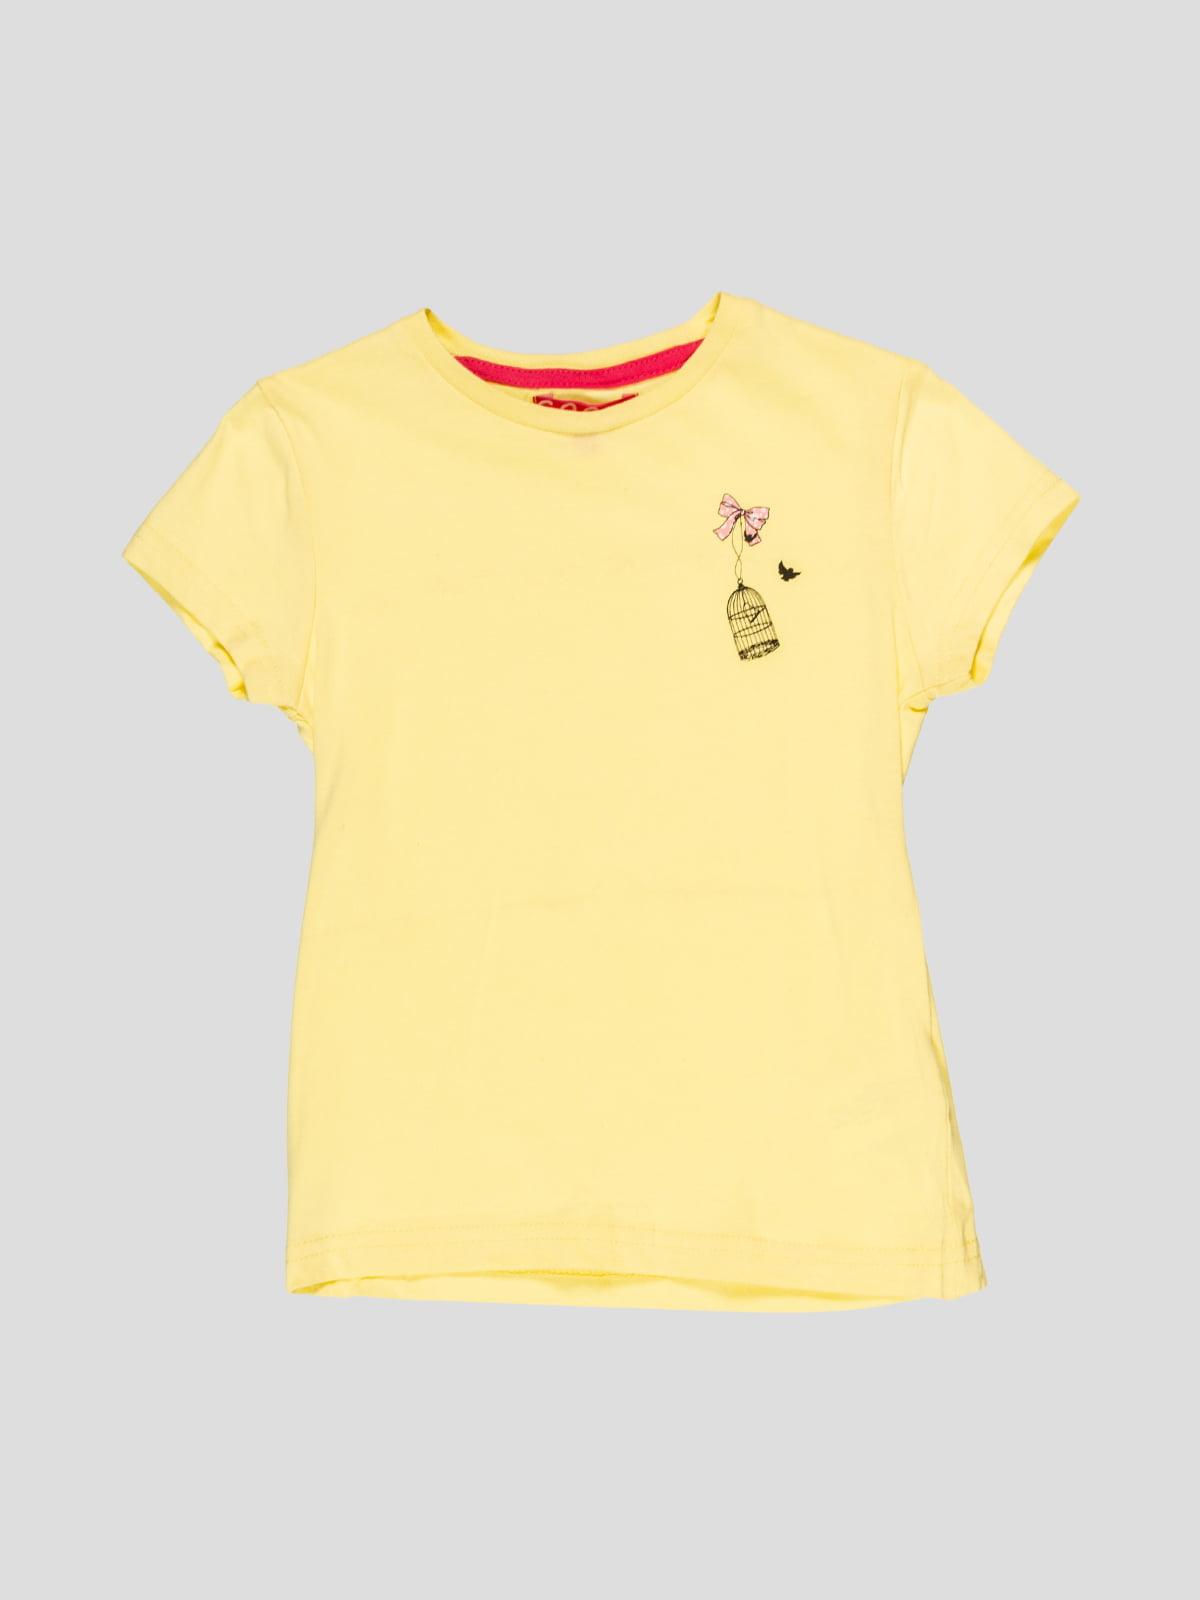 Футболка жовта з принтом | 4854812